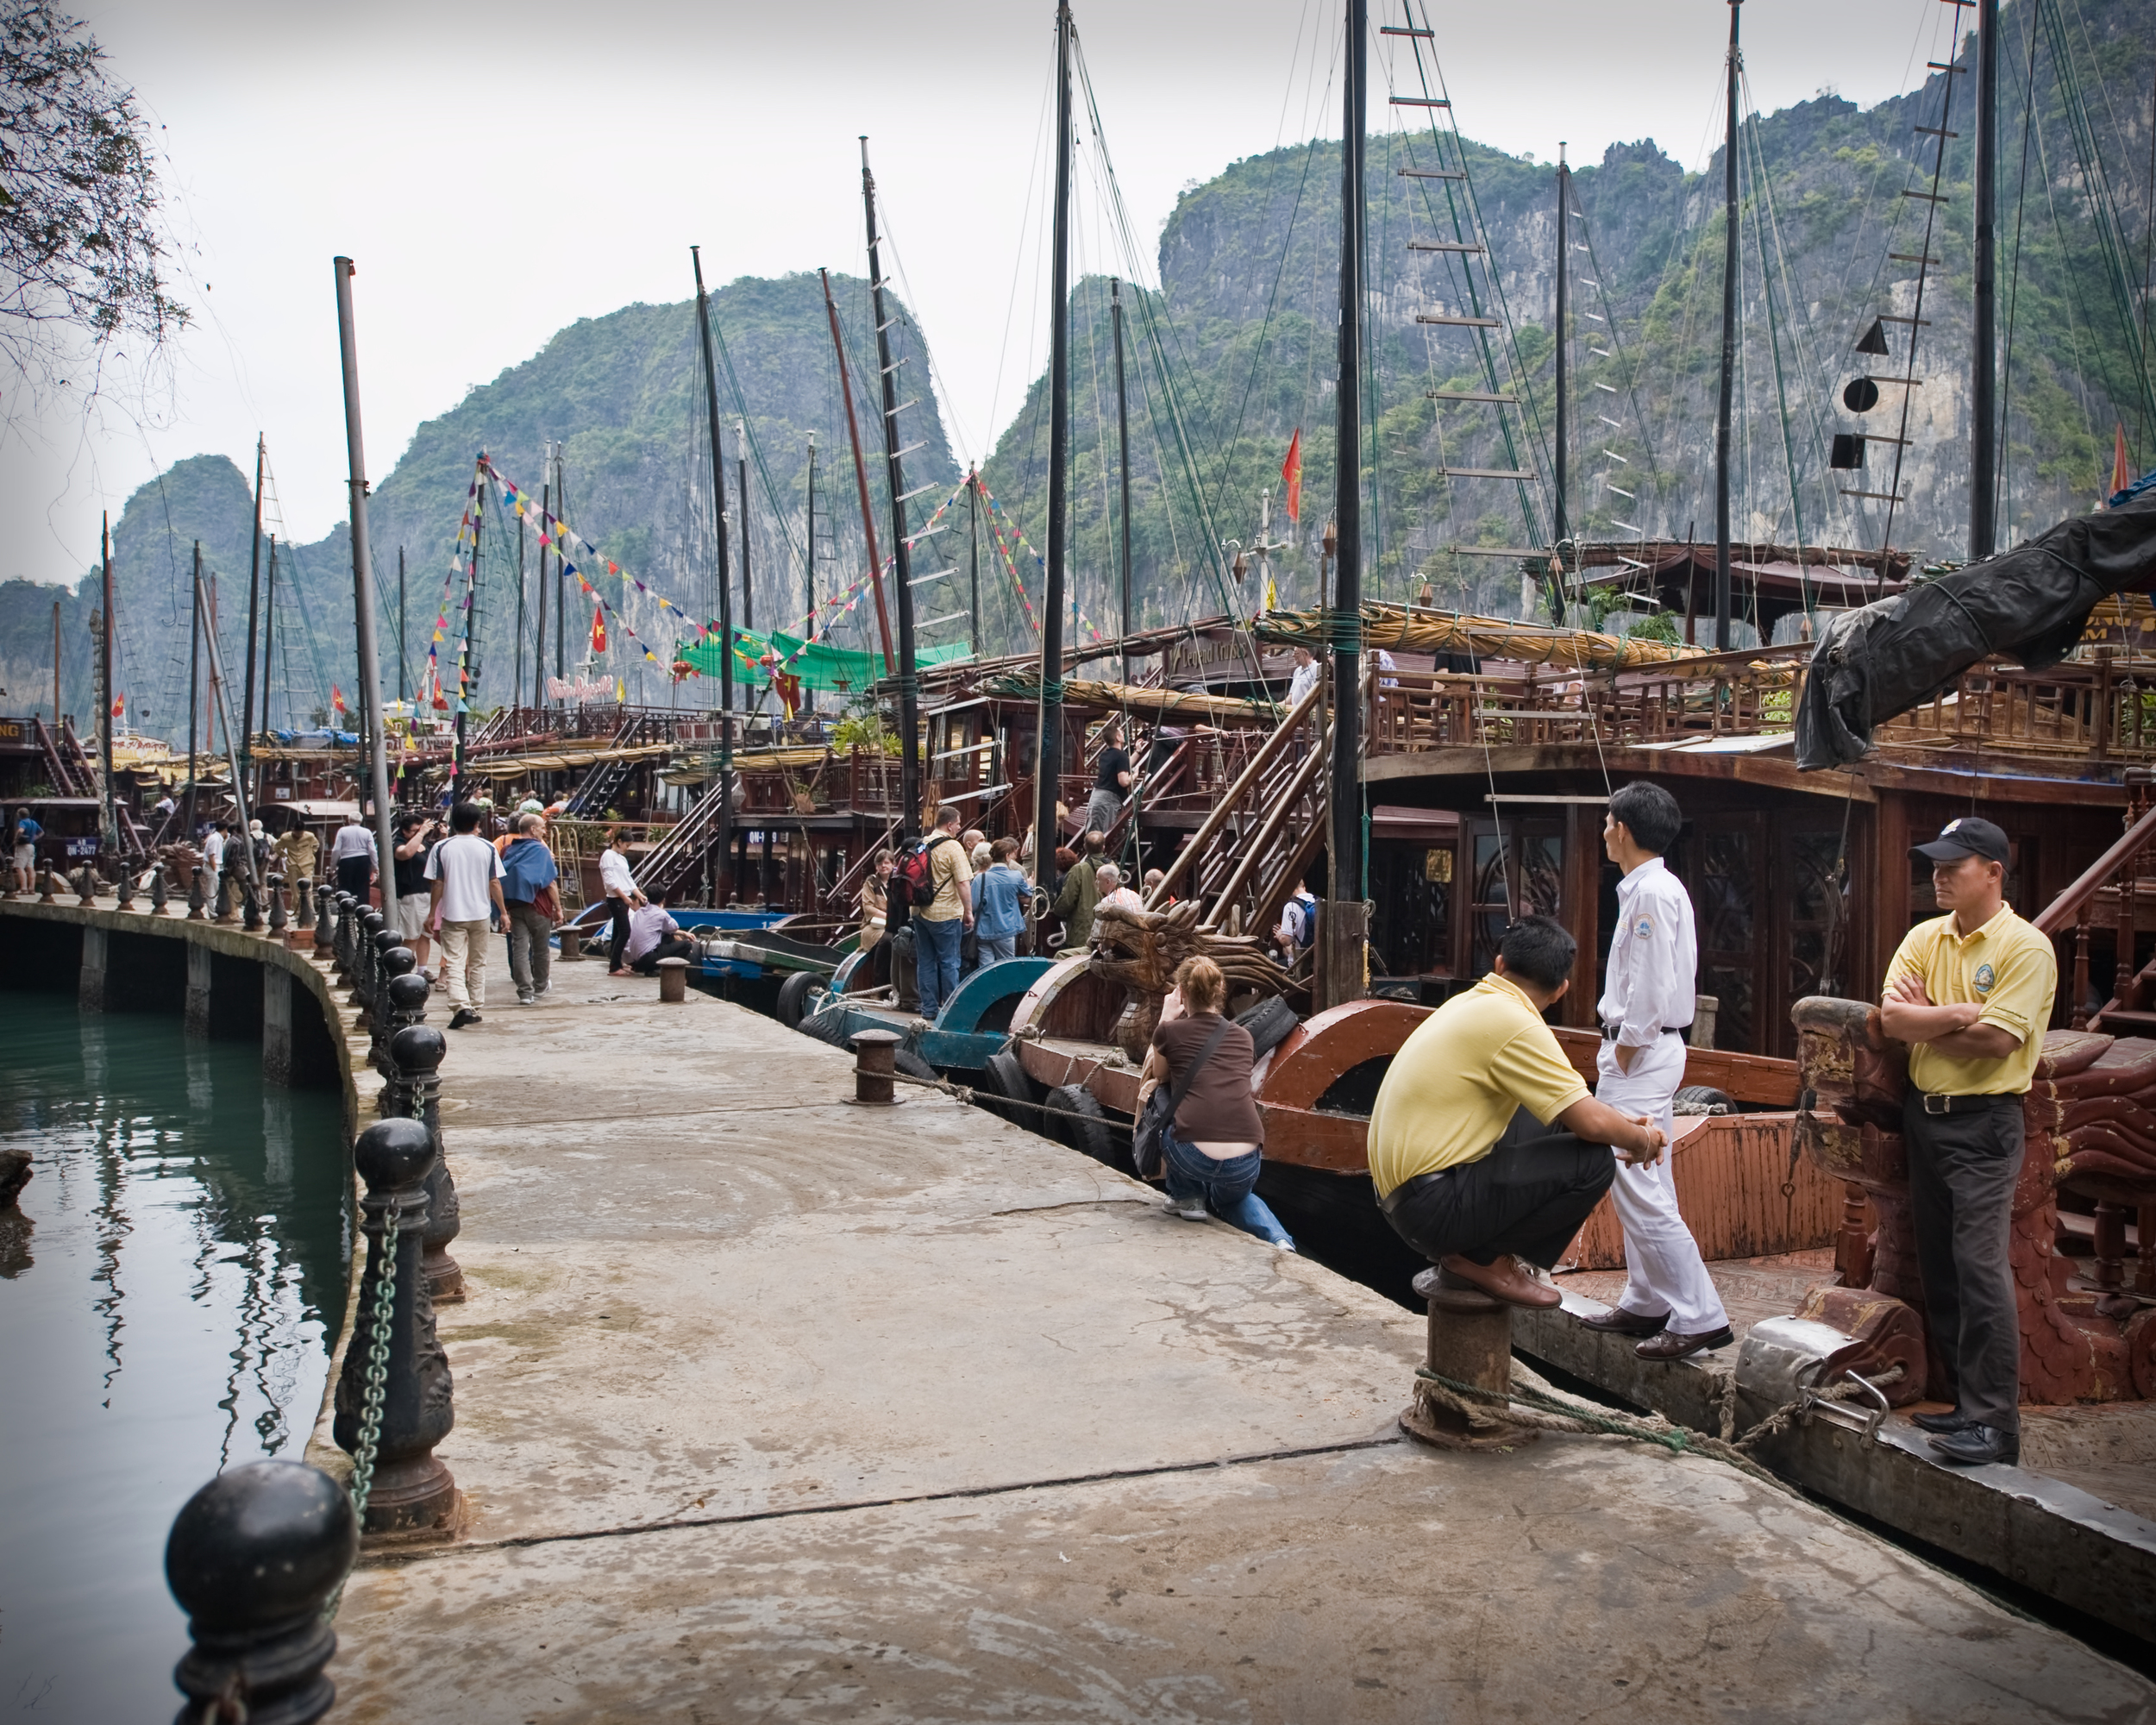 Boats at the tourist island dock, Ha Long Bay.